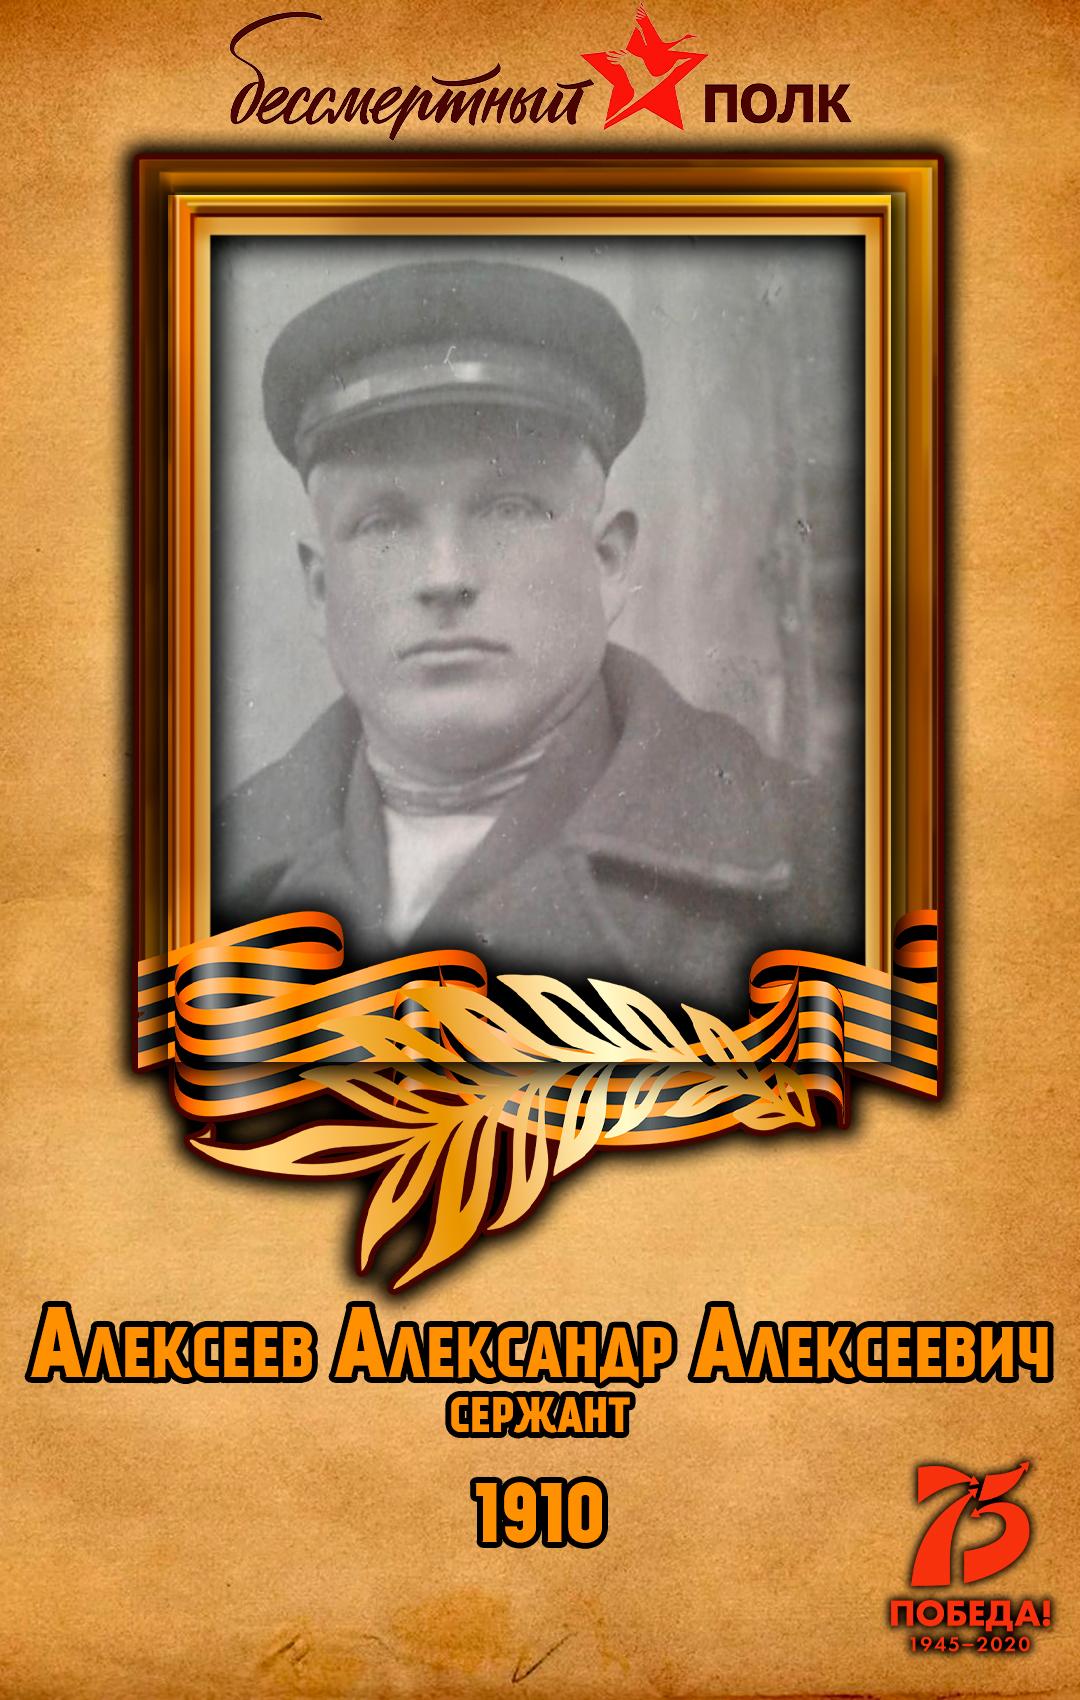 Алексеев-Александр-Алексеевич